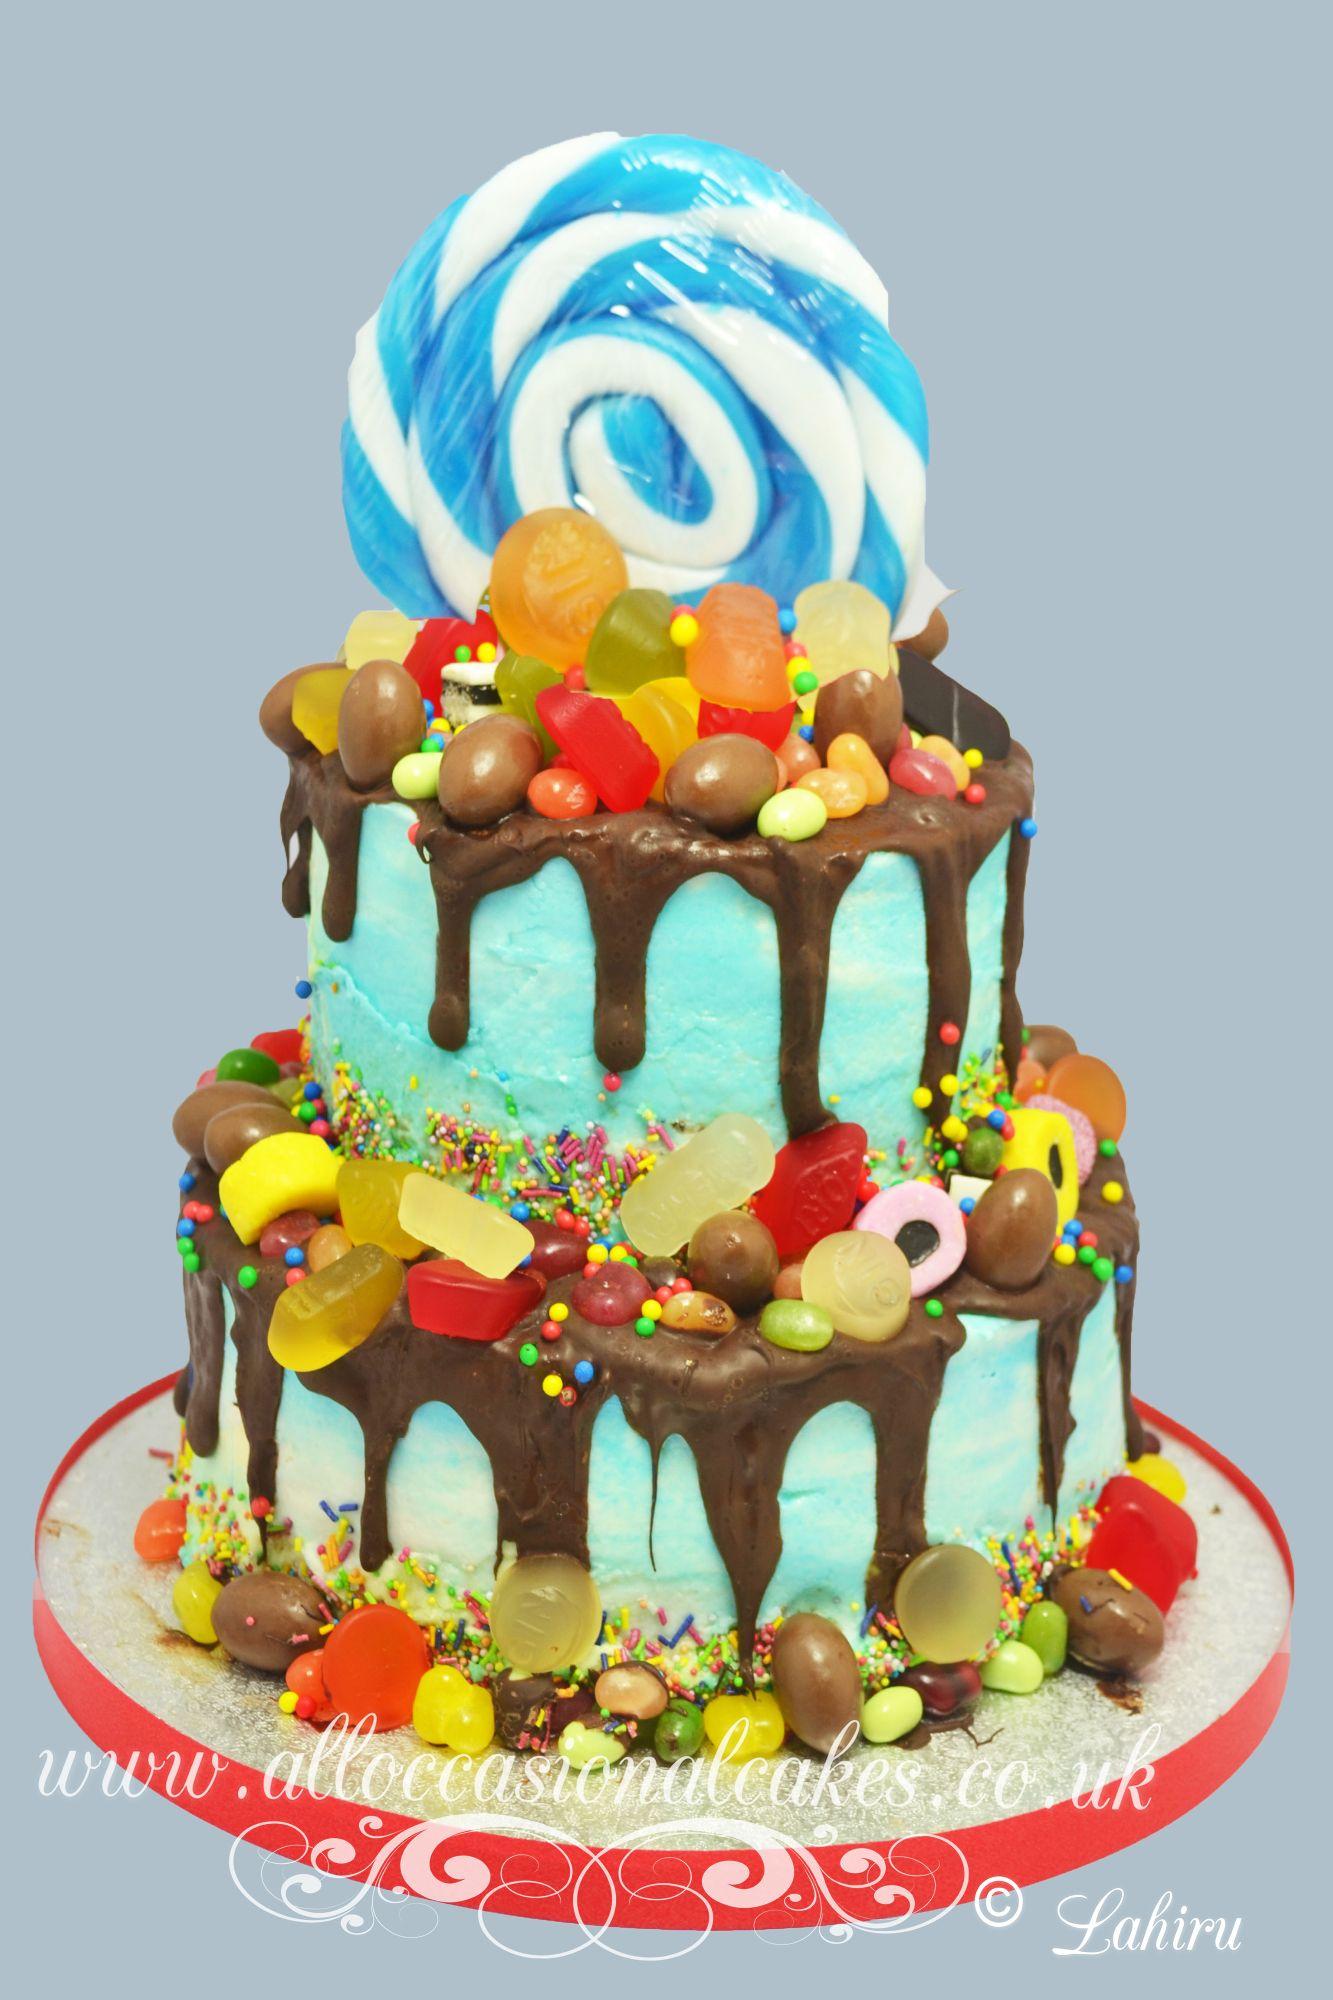 sweet candy themed birthday cake